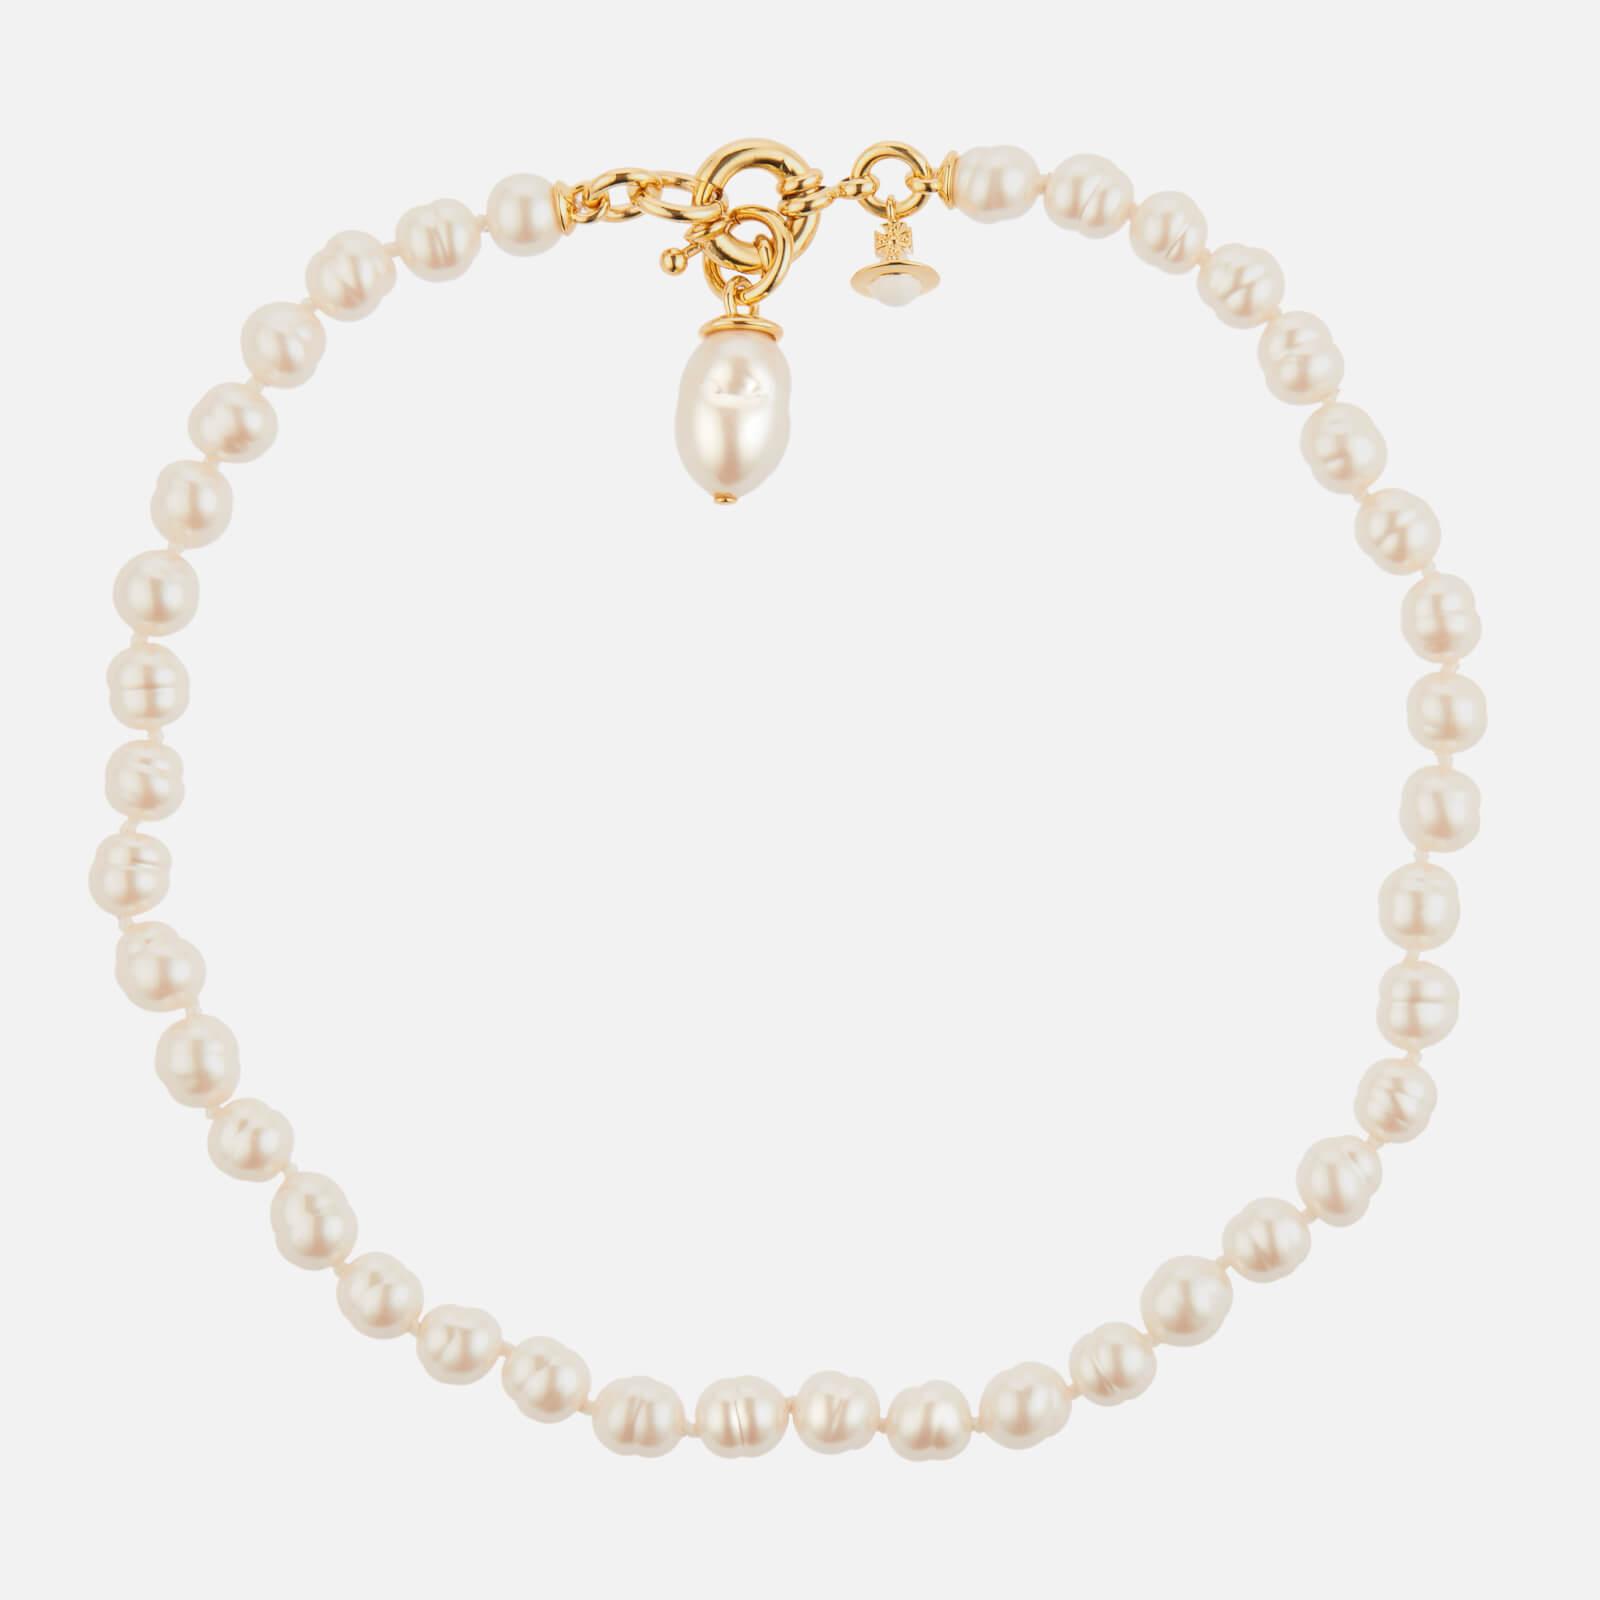 Vivienne Westwood Women's Marella Necklace - Gold Pearl